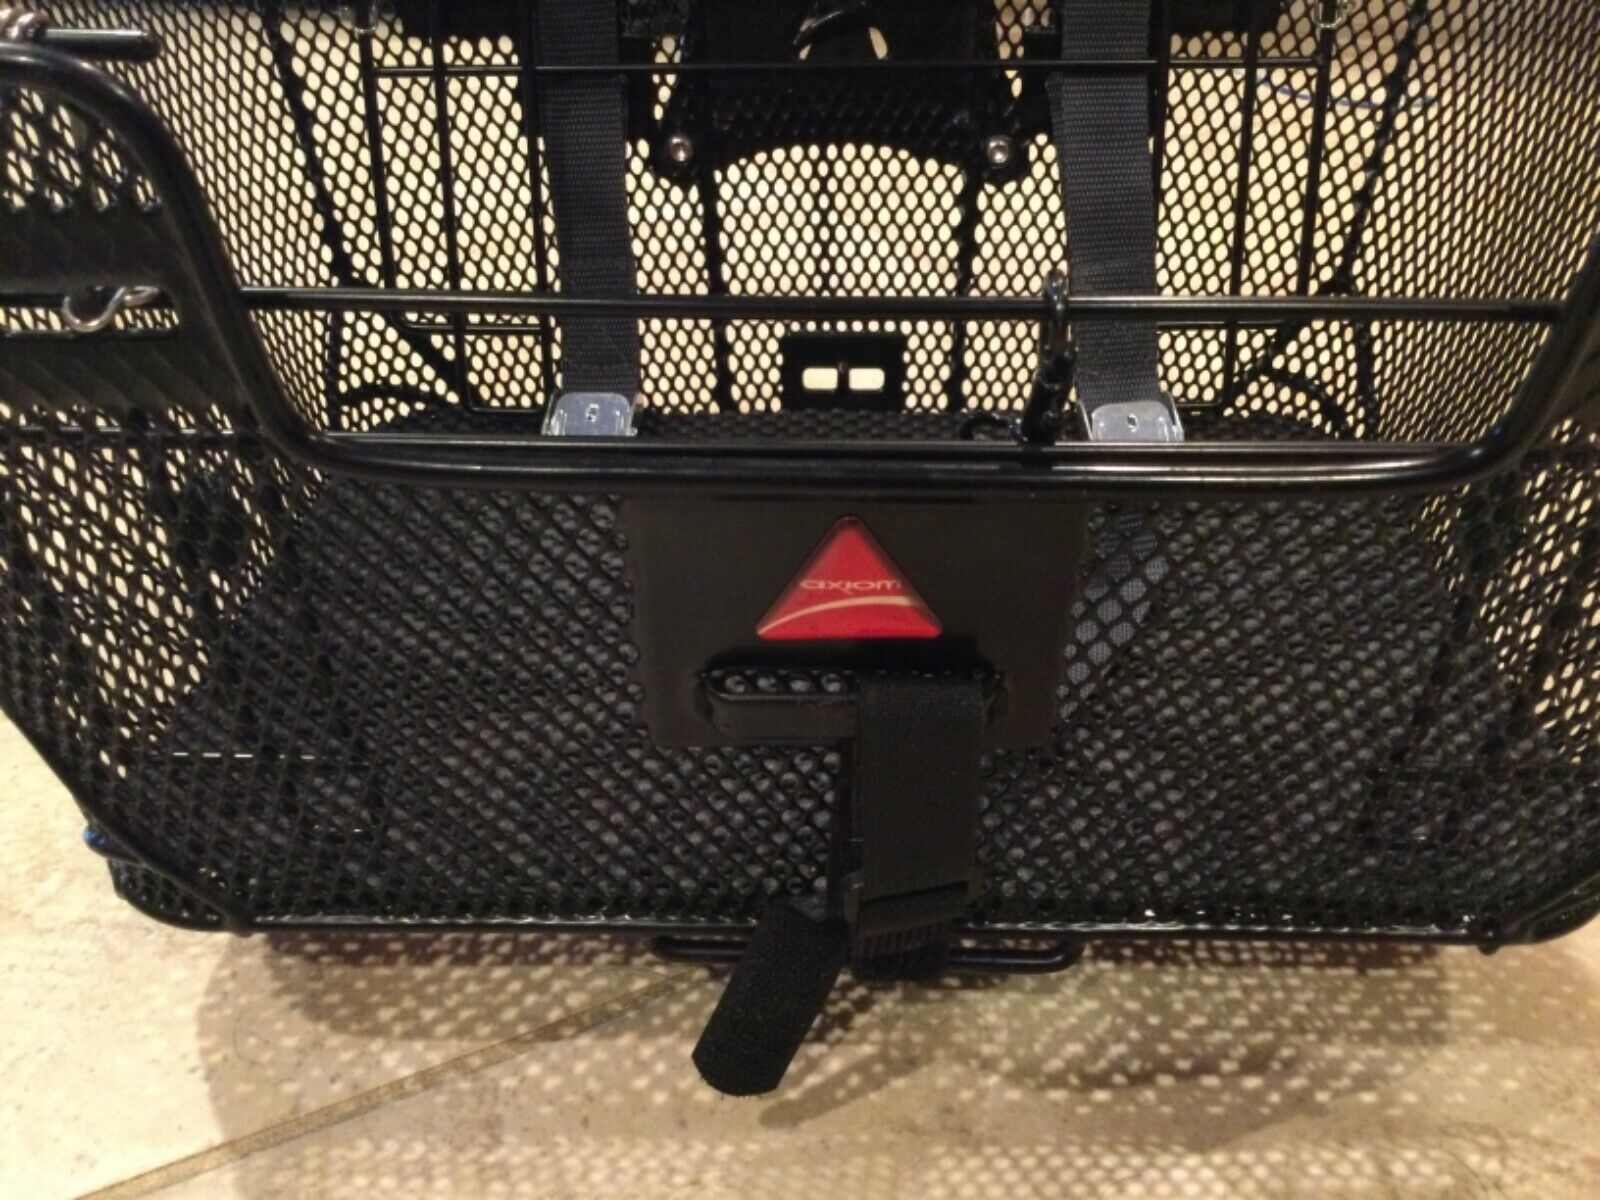 Axiom Pet Bicycle Basket with Rack & Handlebar Mounts: Black (New - 109.99 USD)